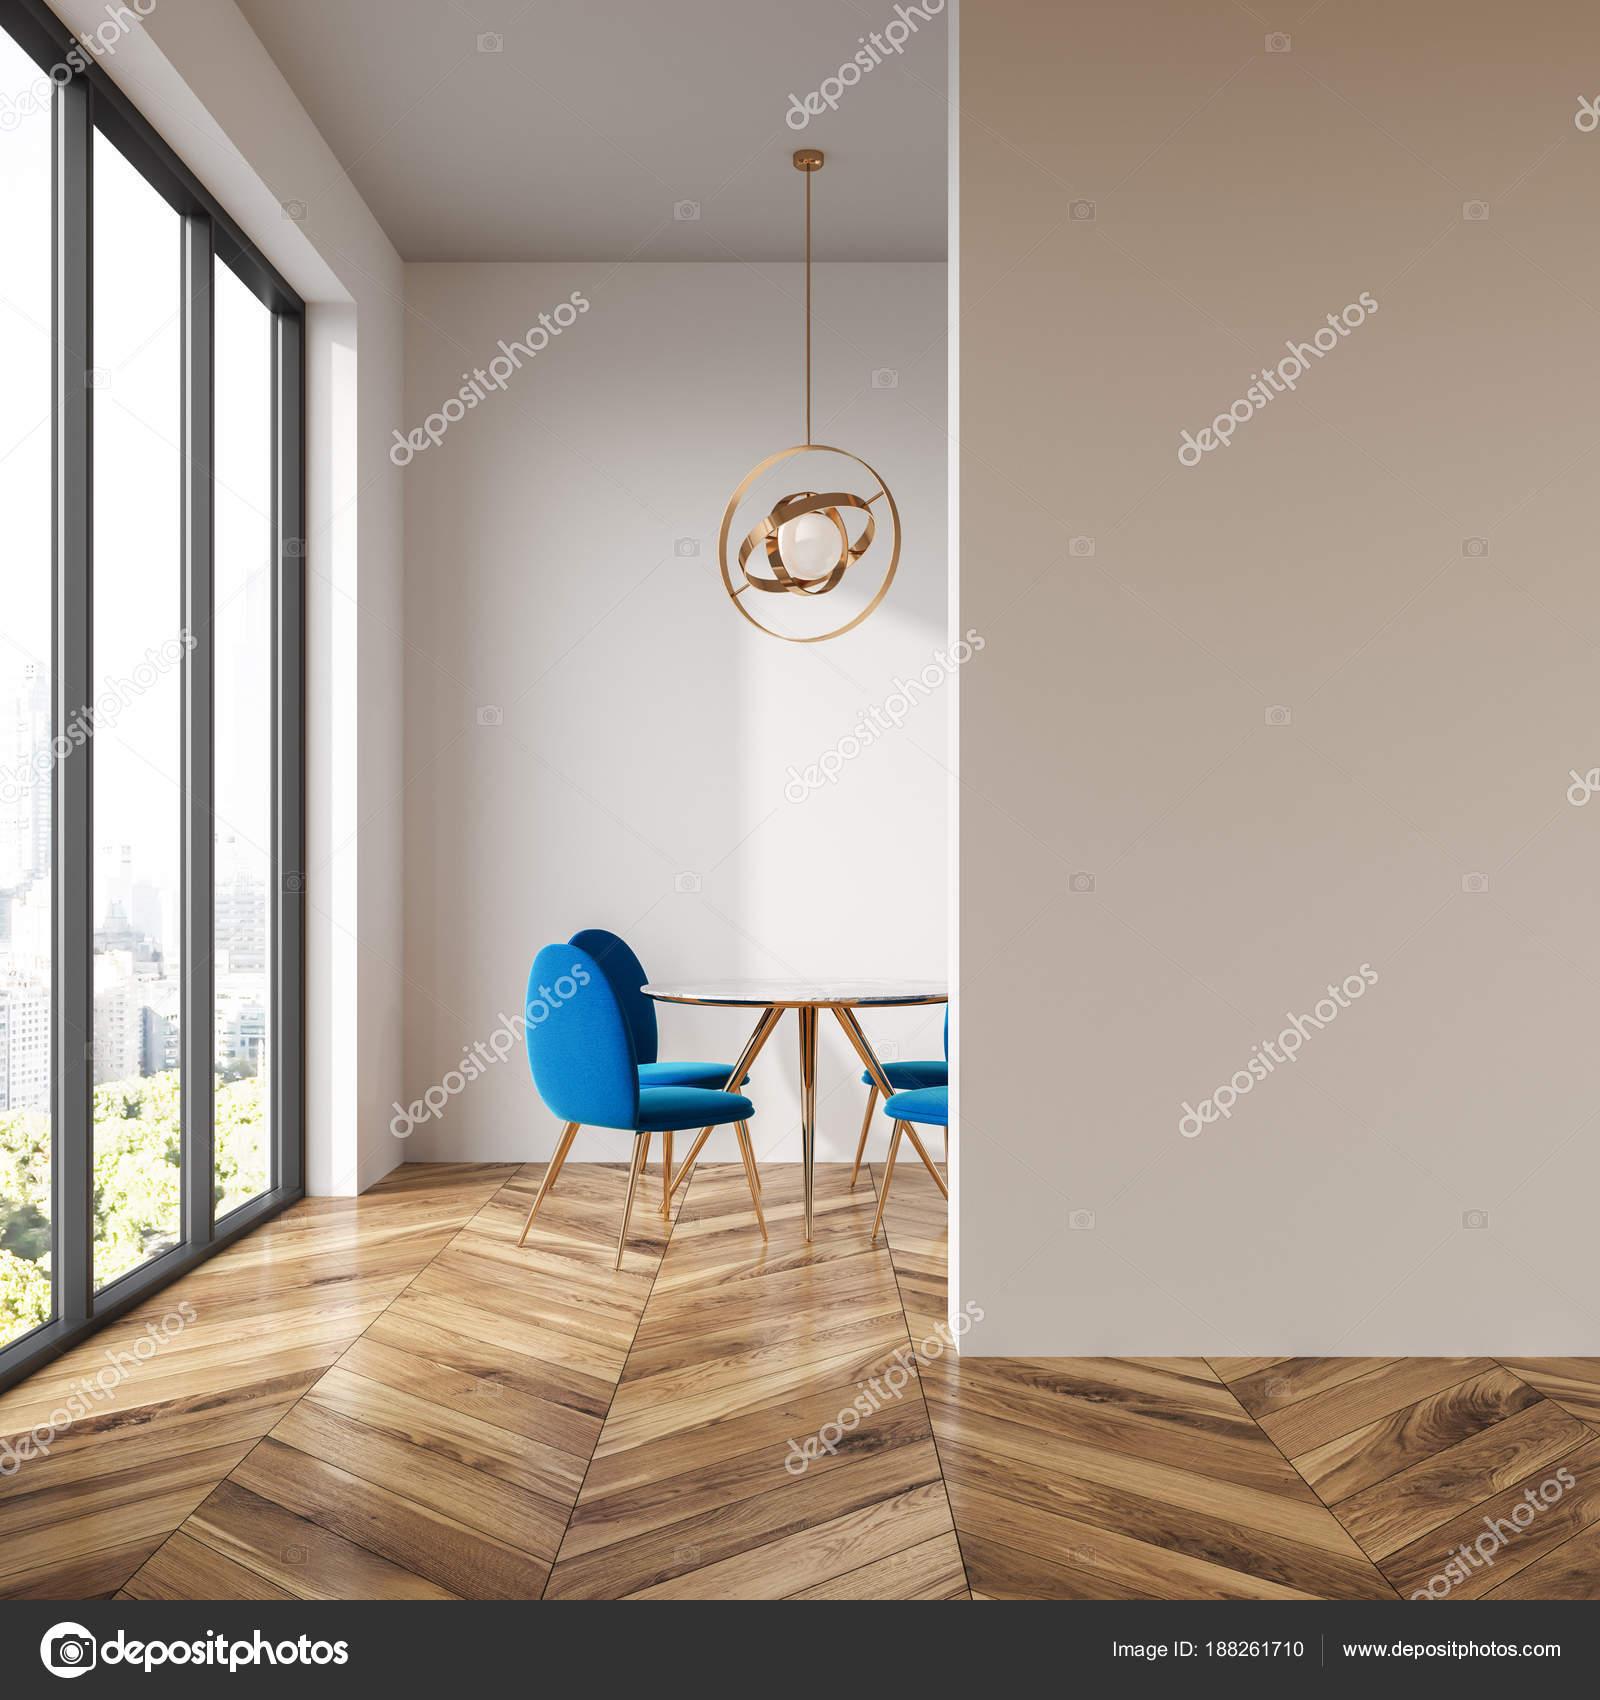 https://st3.depositphotos.com/2673929/18826/i/1600/depositphotos_188261710-stockafbeelding-witte-blauwe-stoelen-eetkamer-muur.jpg